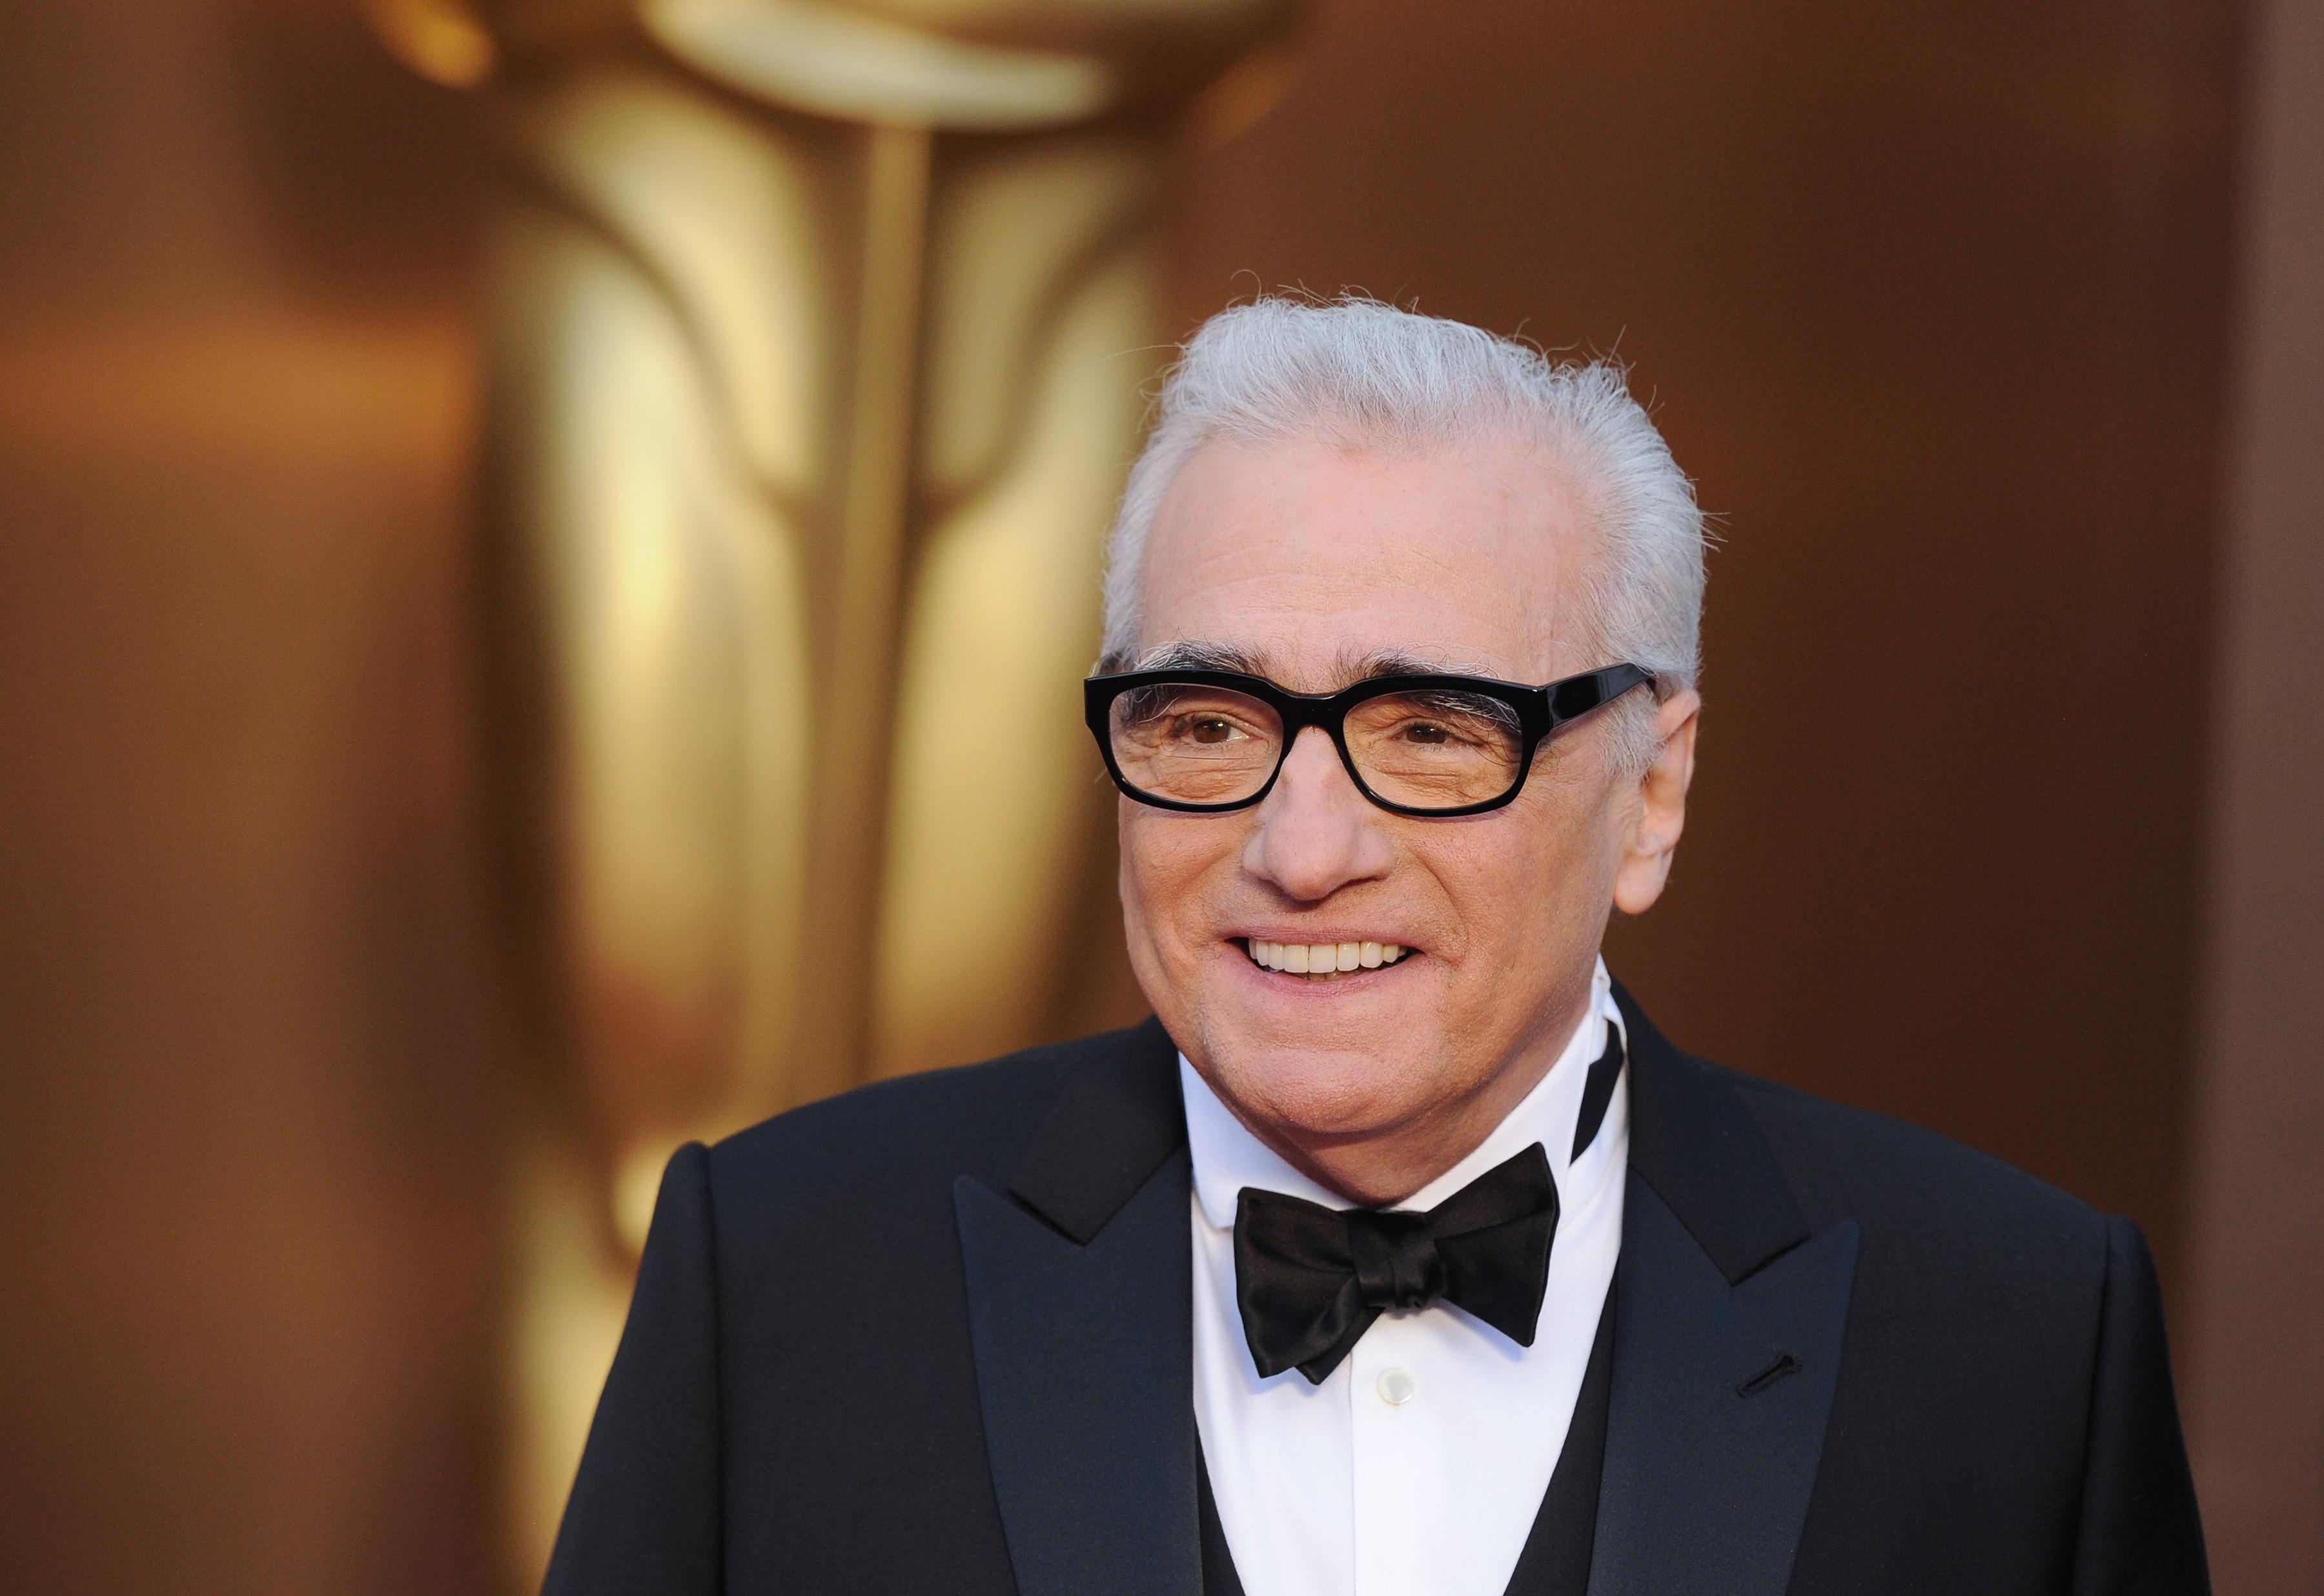 Martin Scorsese Breaks Down His Next Film 'Killers of the Flower Moon'